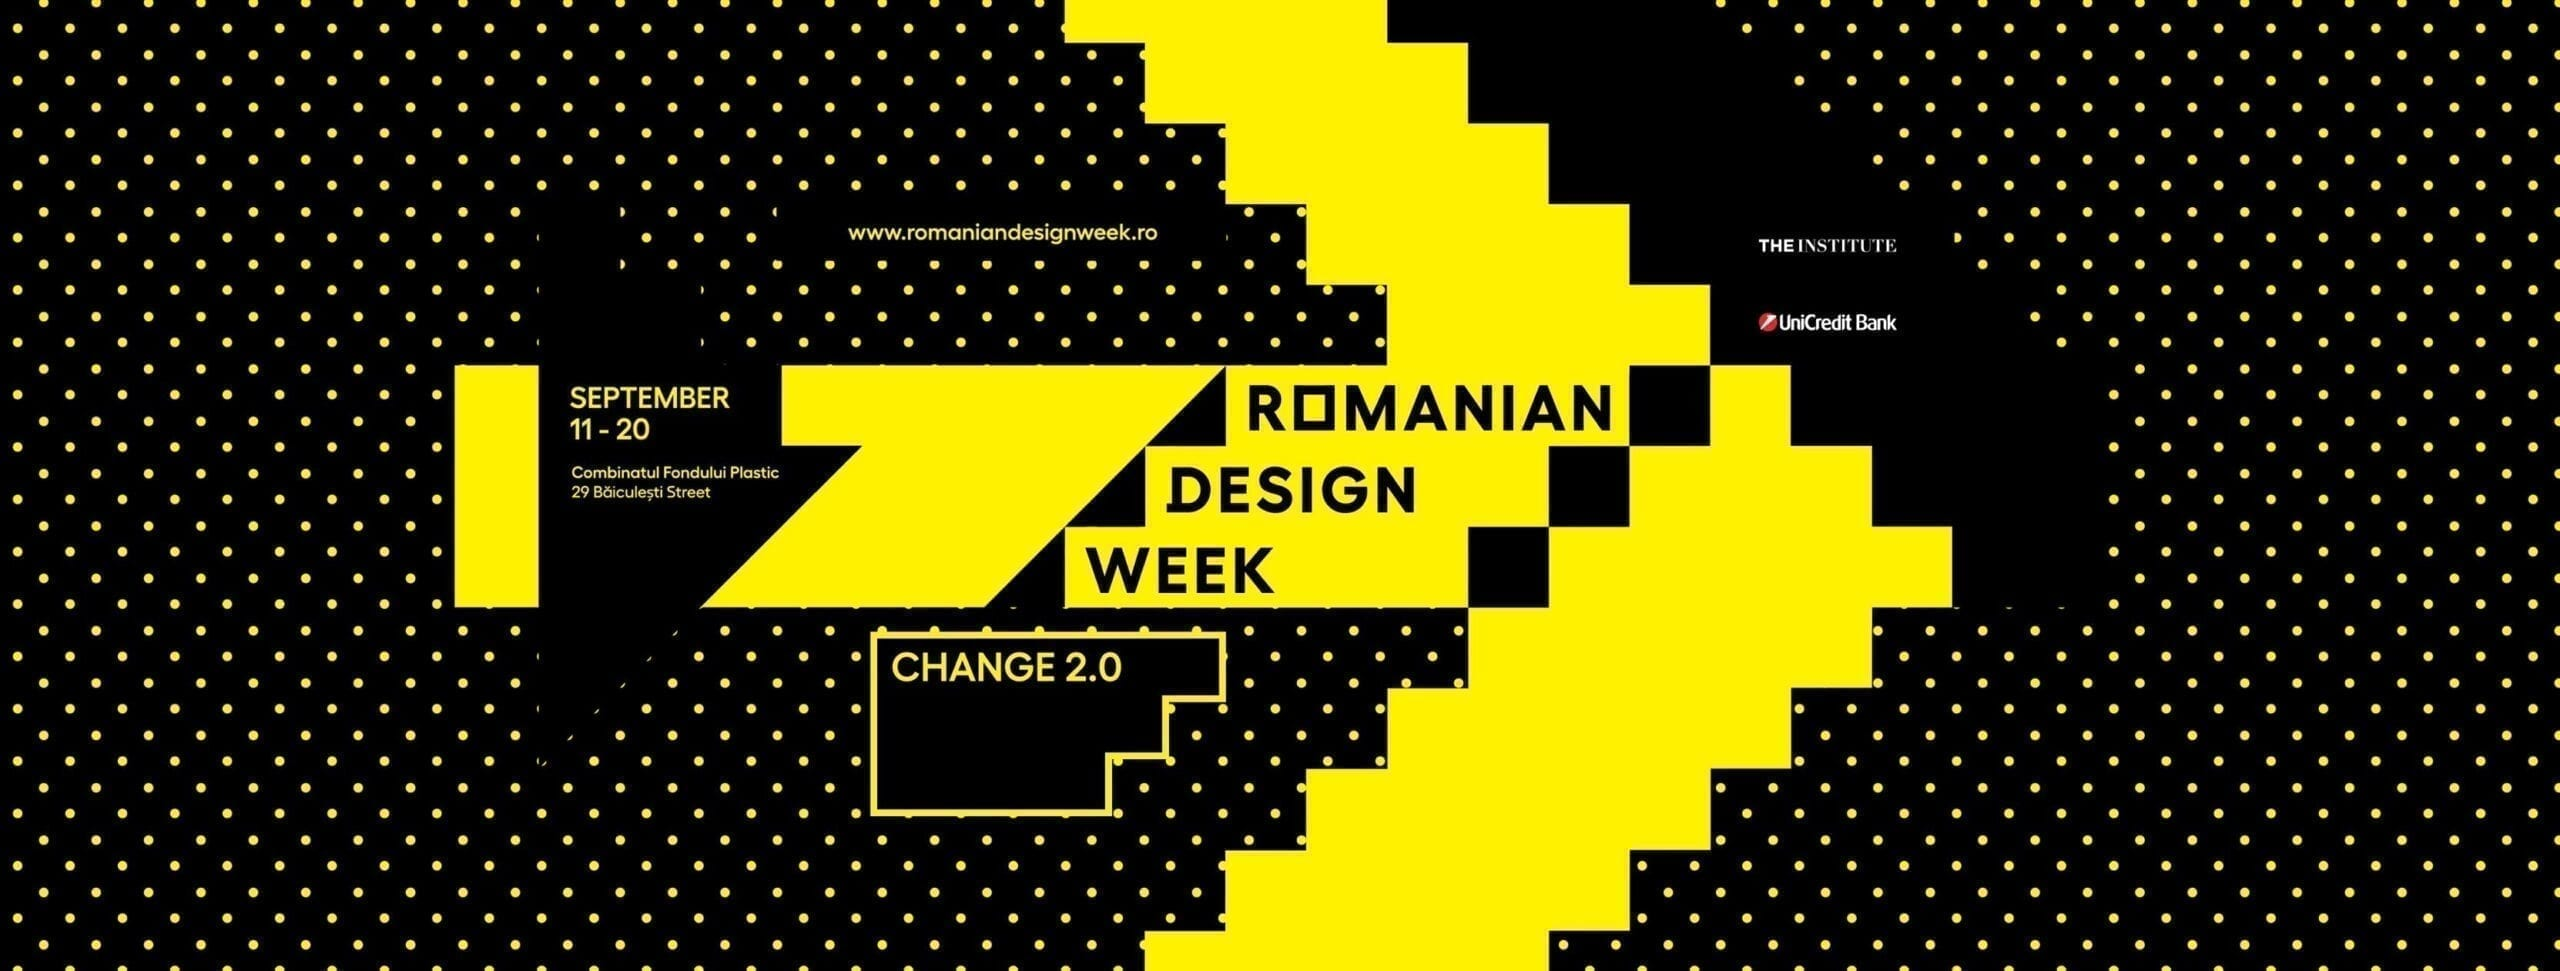 Romanian Design Week 2020 - Expoziția Change 2.0